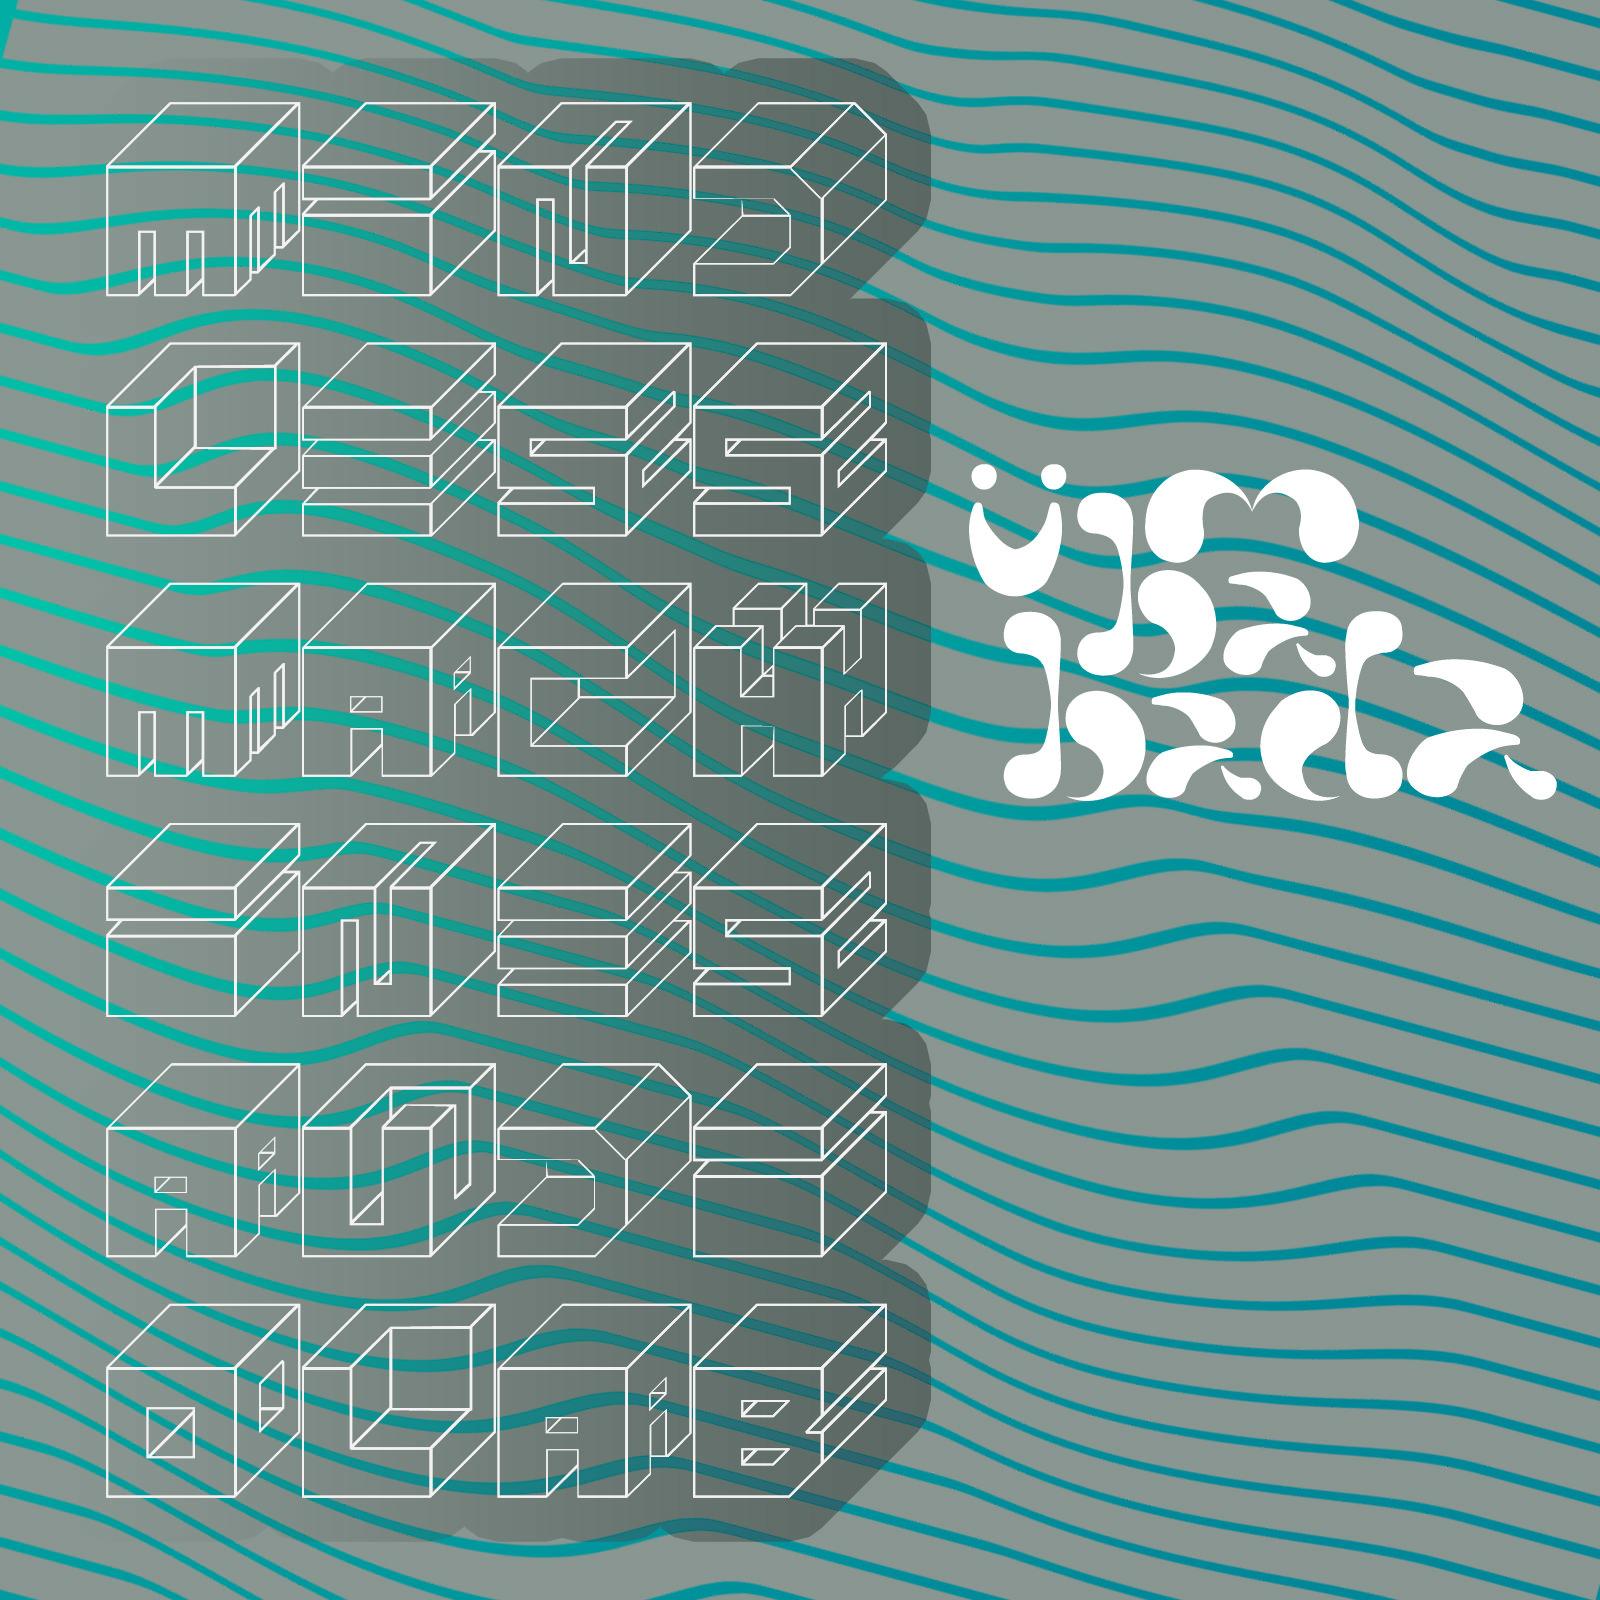 Üm Ba Bada by Mindless Machines Audio Lab